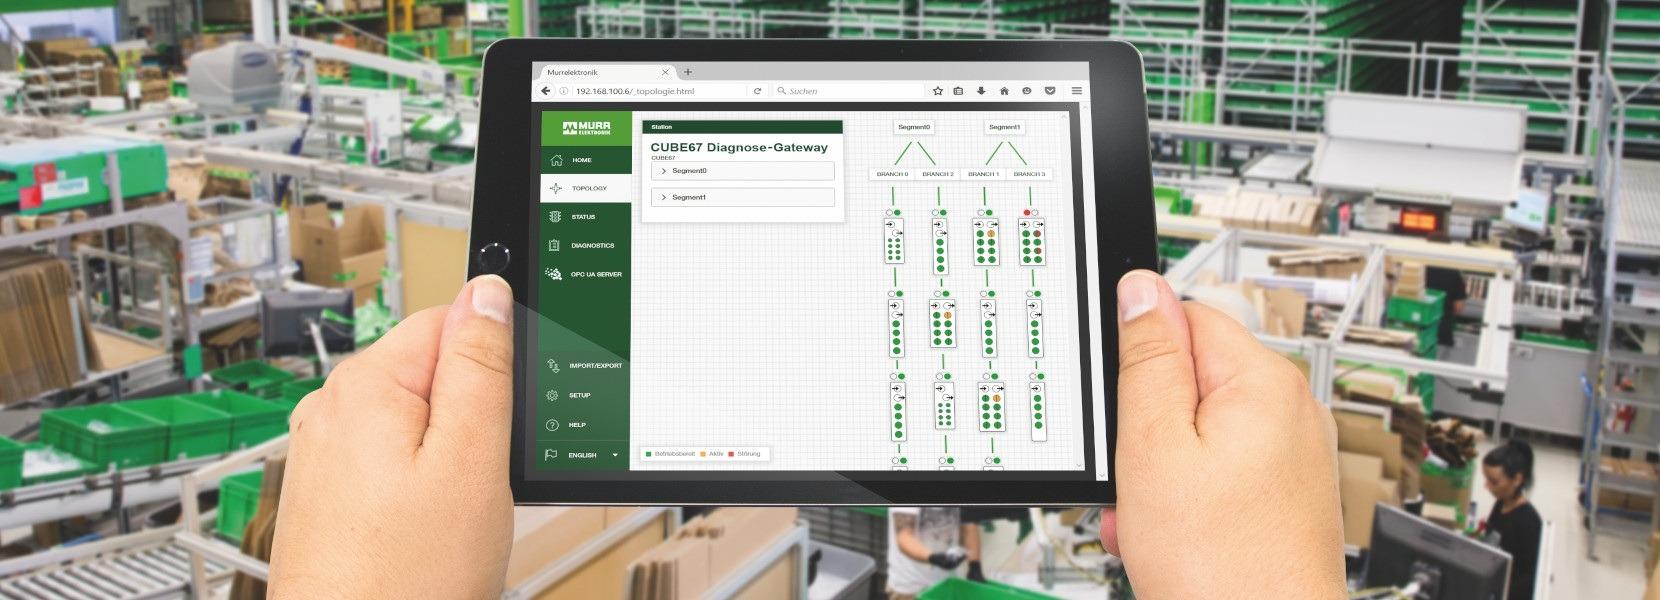 Cube67 Diagnostics Gateway – Diagnostics Made Easy